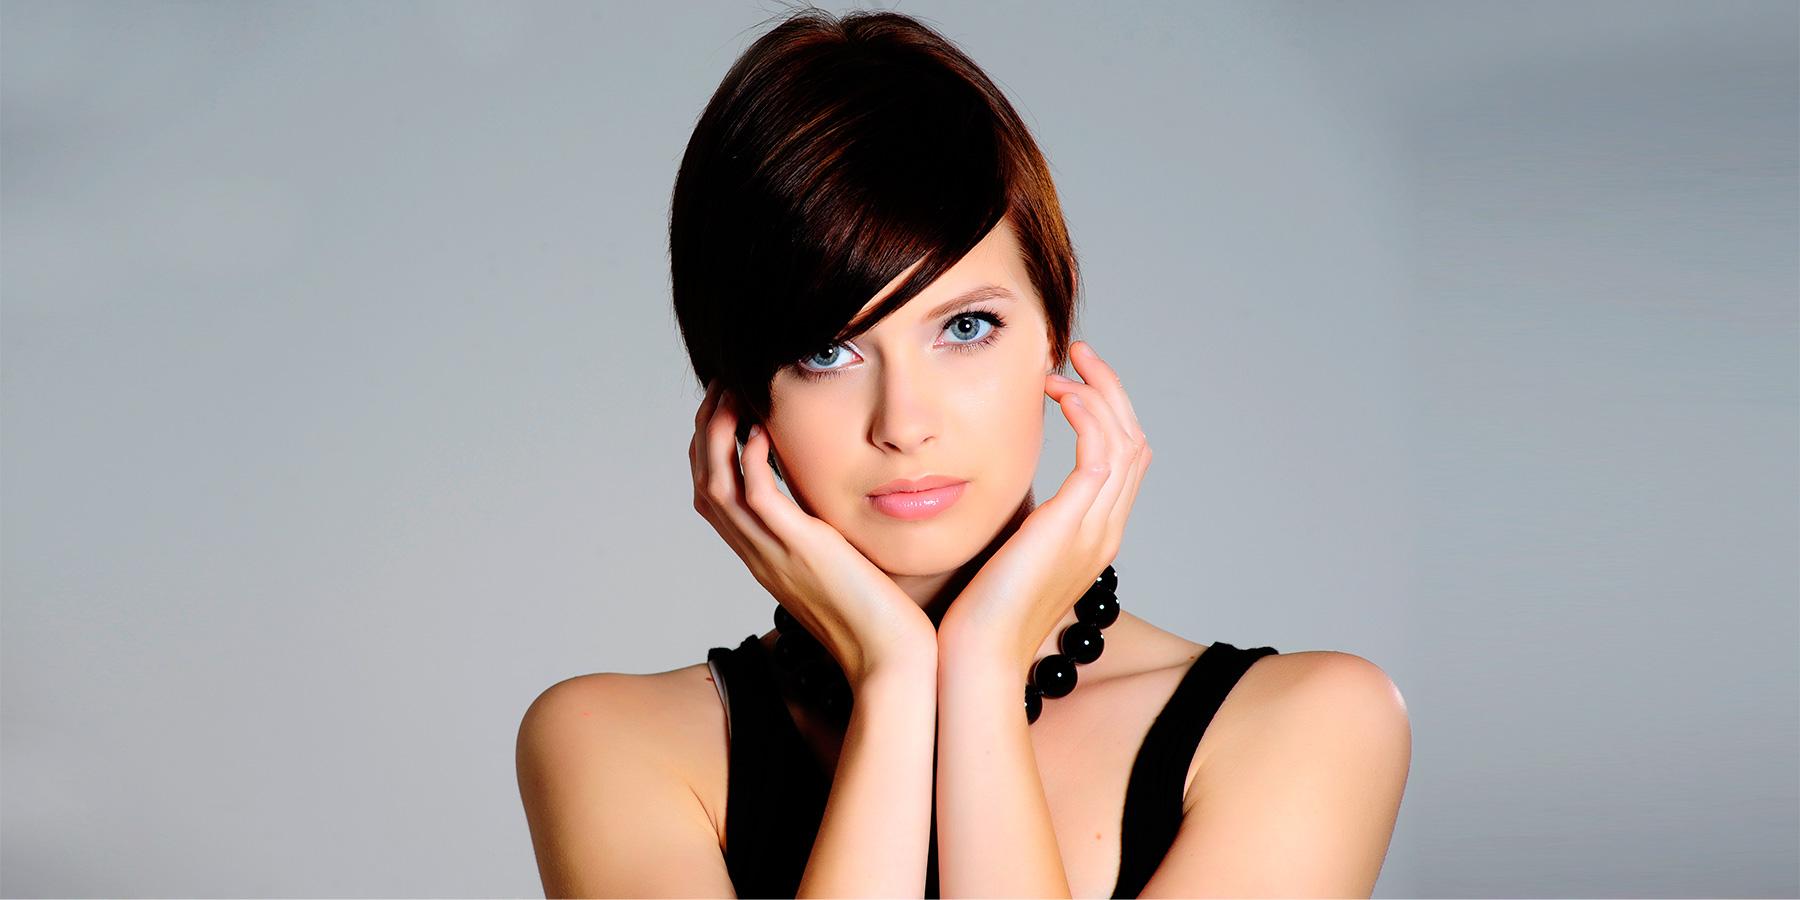 fotografo beauty belleza madrid